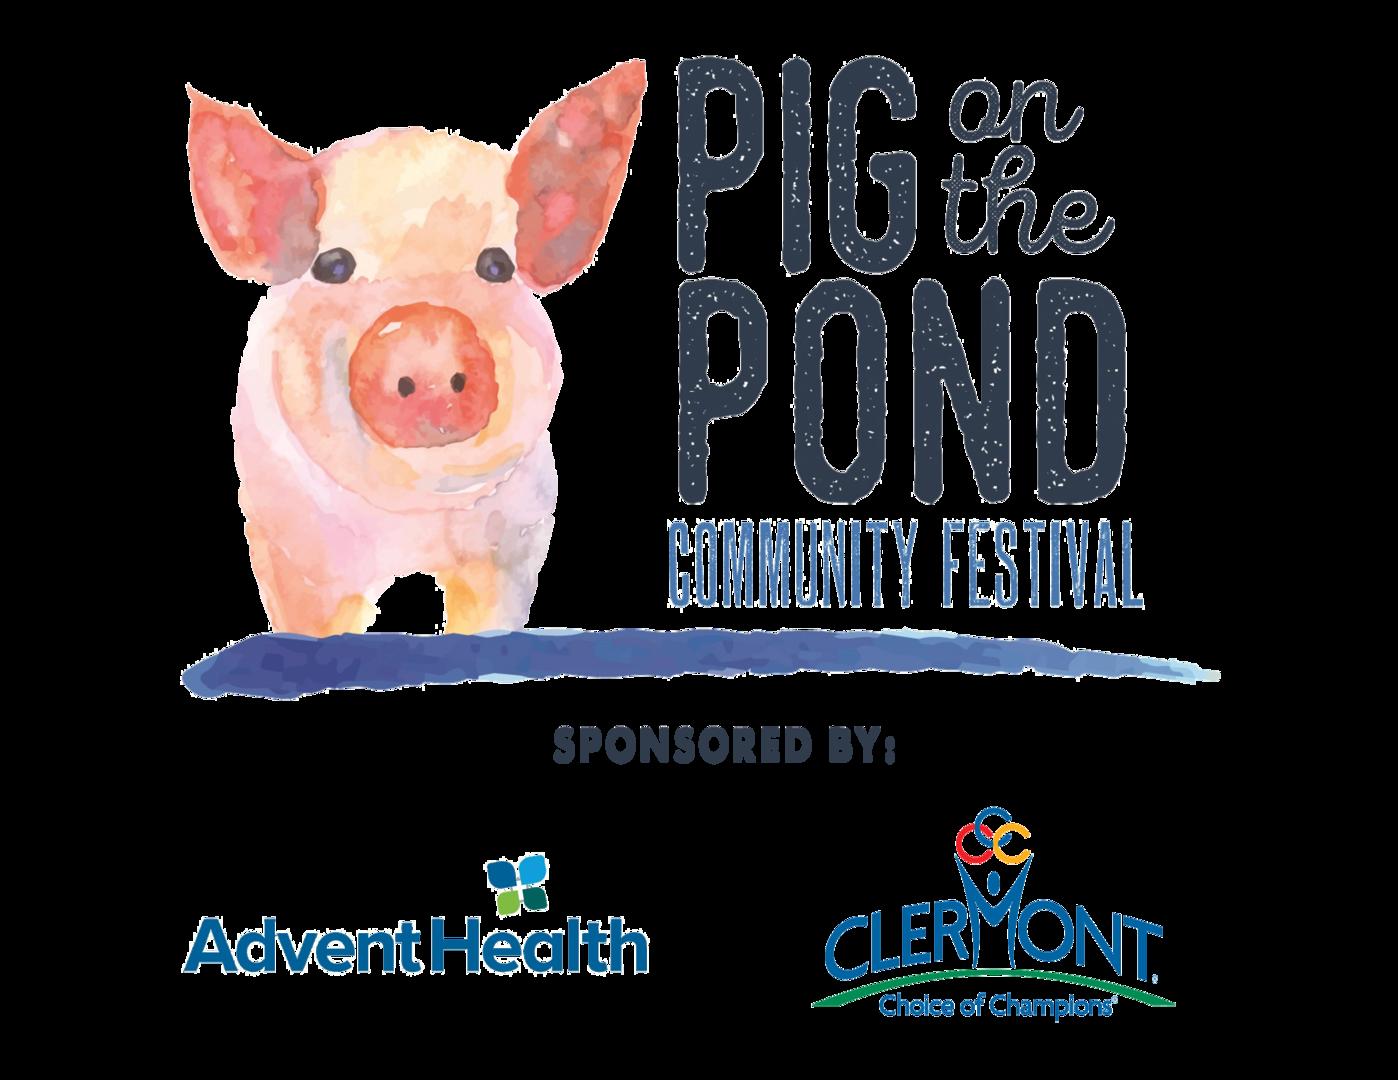 Pig on the Pond Community Festival